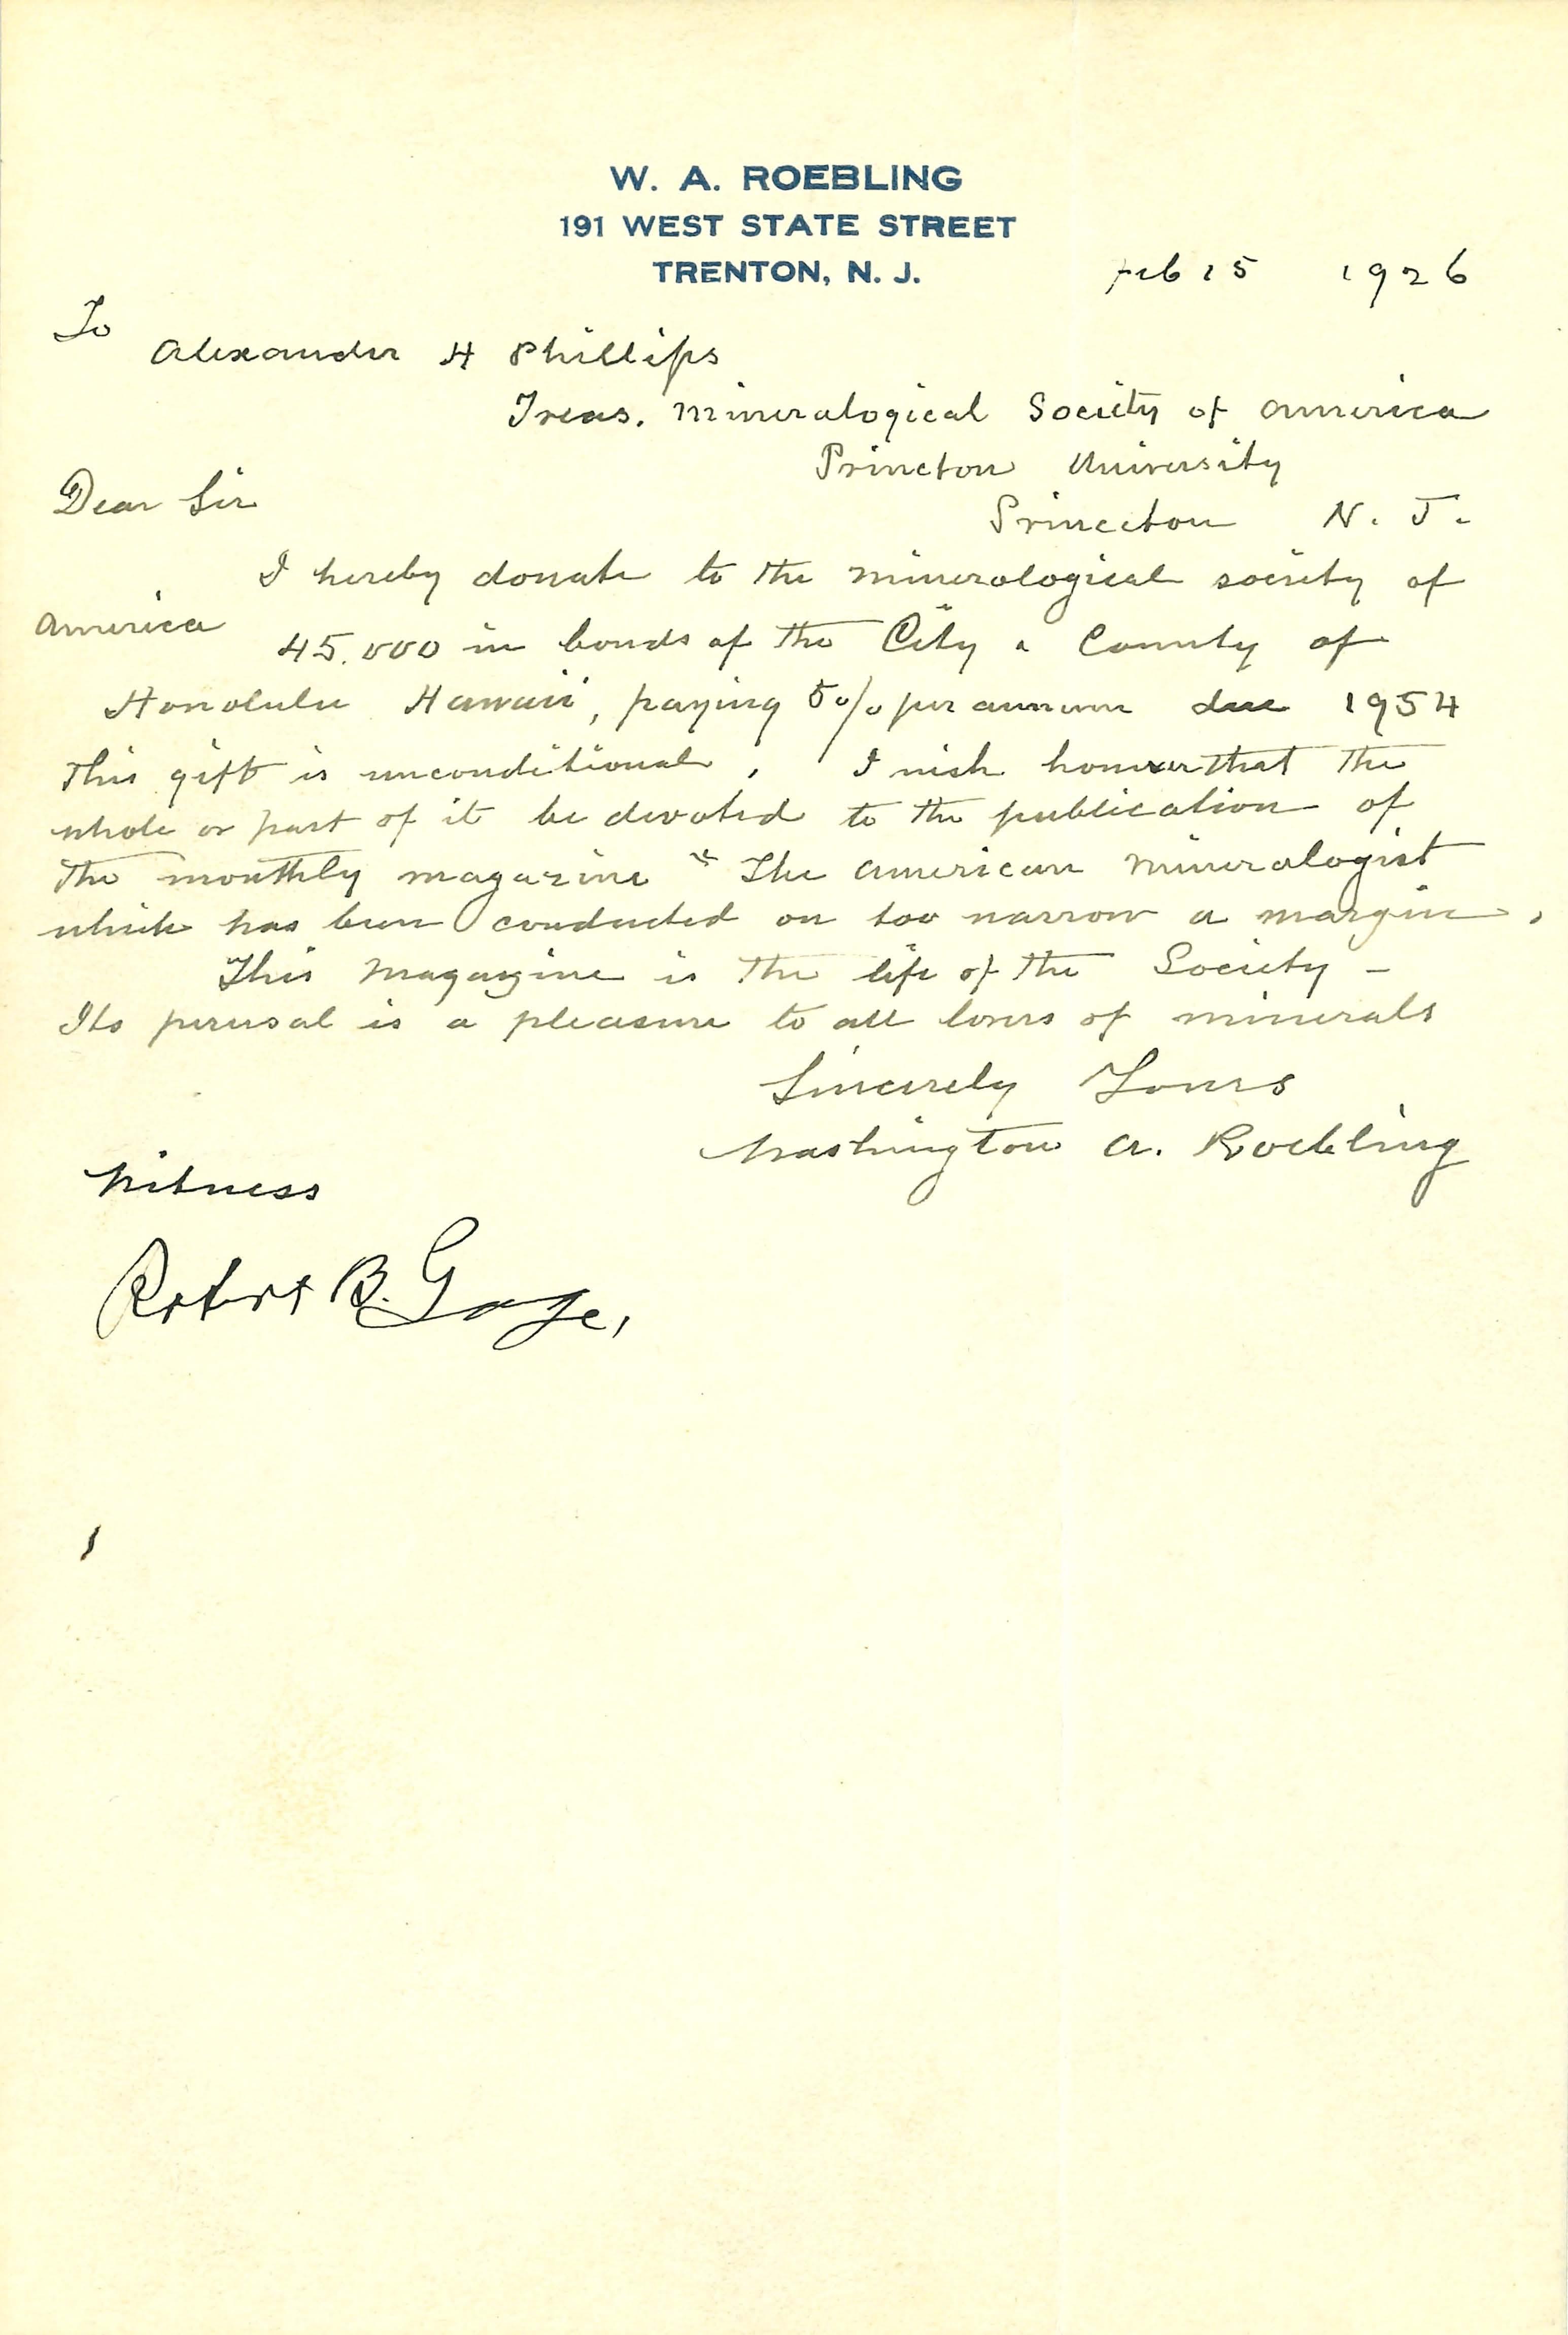 Roebling Donation letter